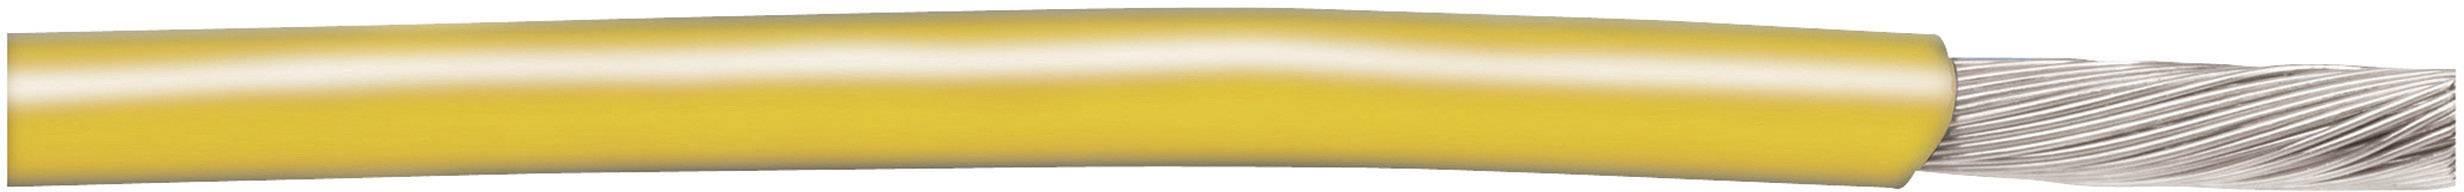 Pletenica 1 x 0.32 mm, rumena AlphaWire 3071 YL001 cena za meter